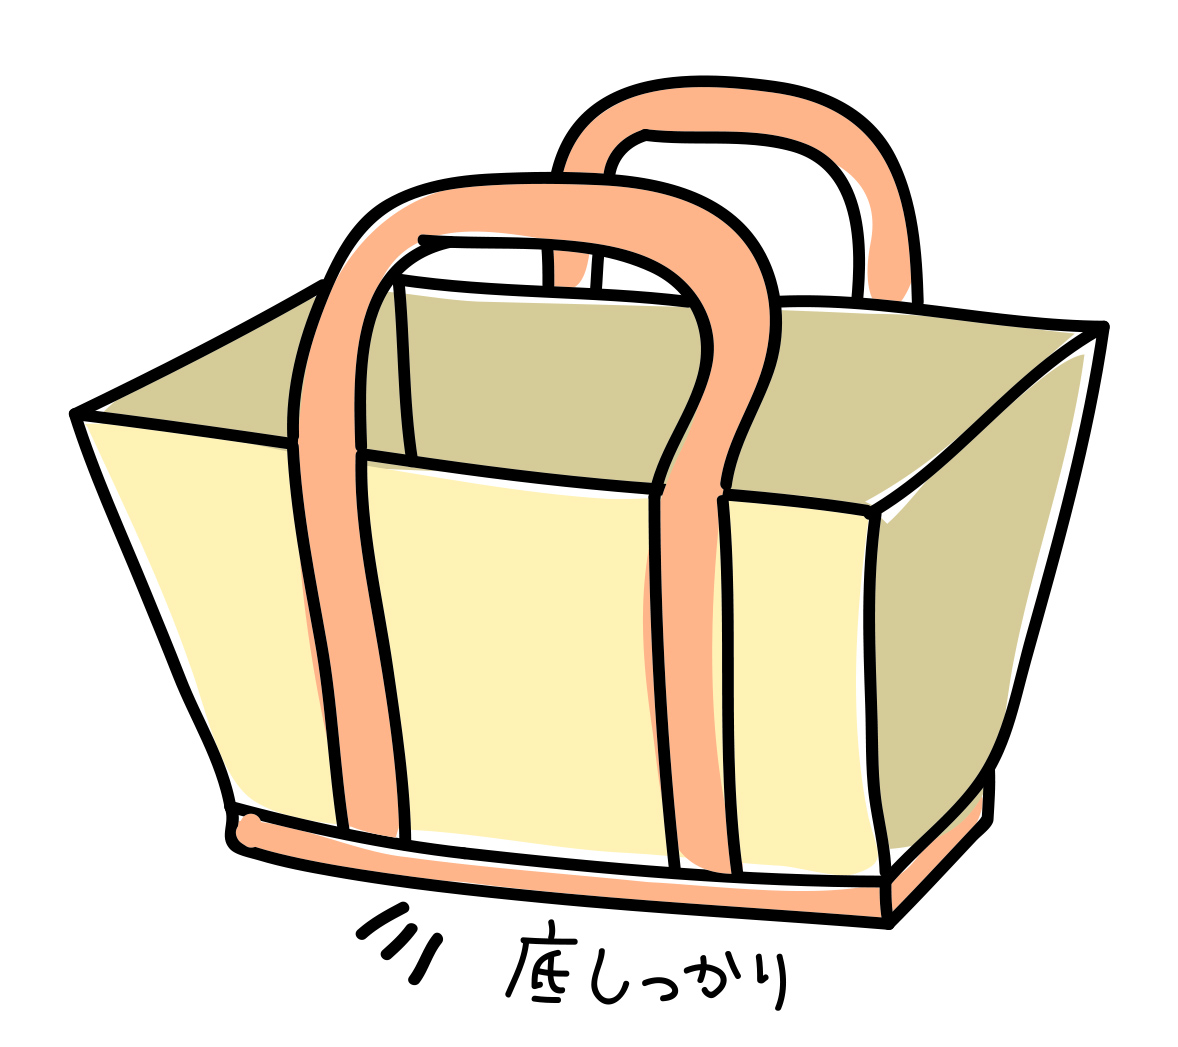 f:id:asakuraya:20200729144640j:plain